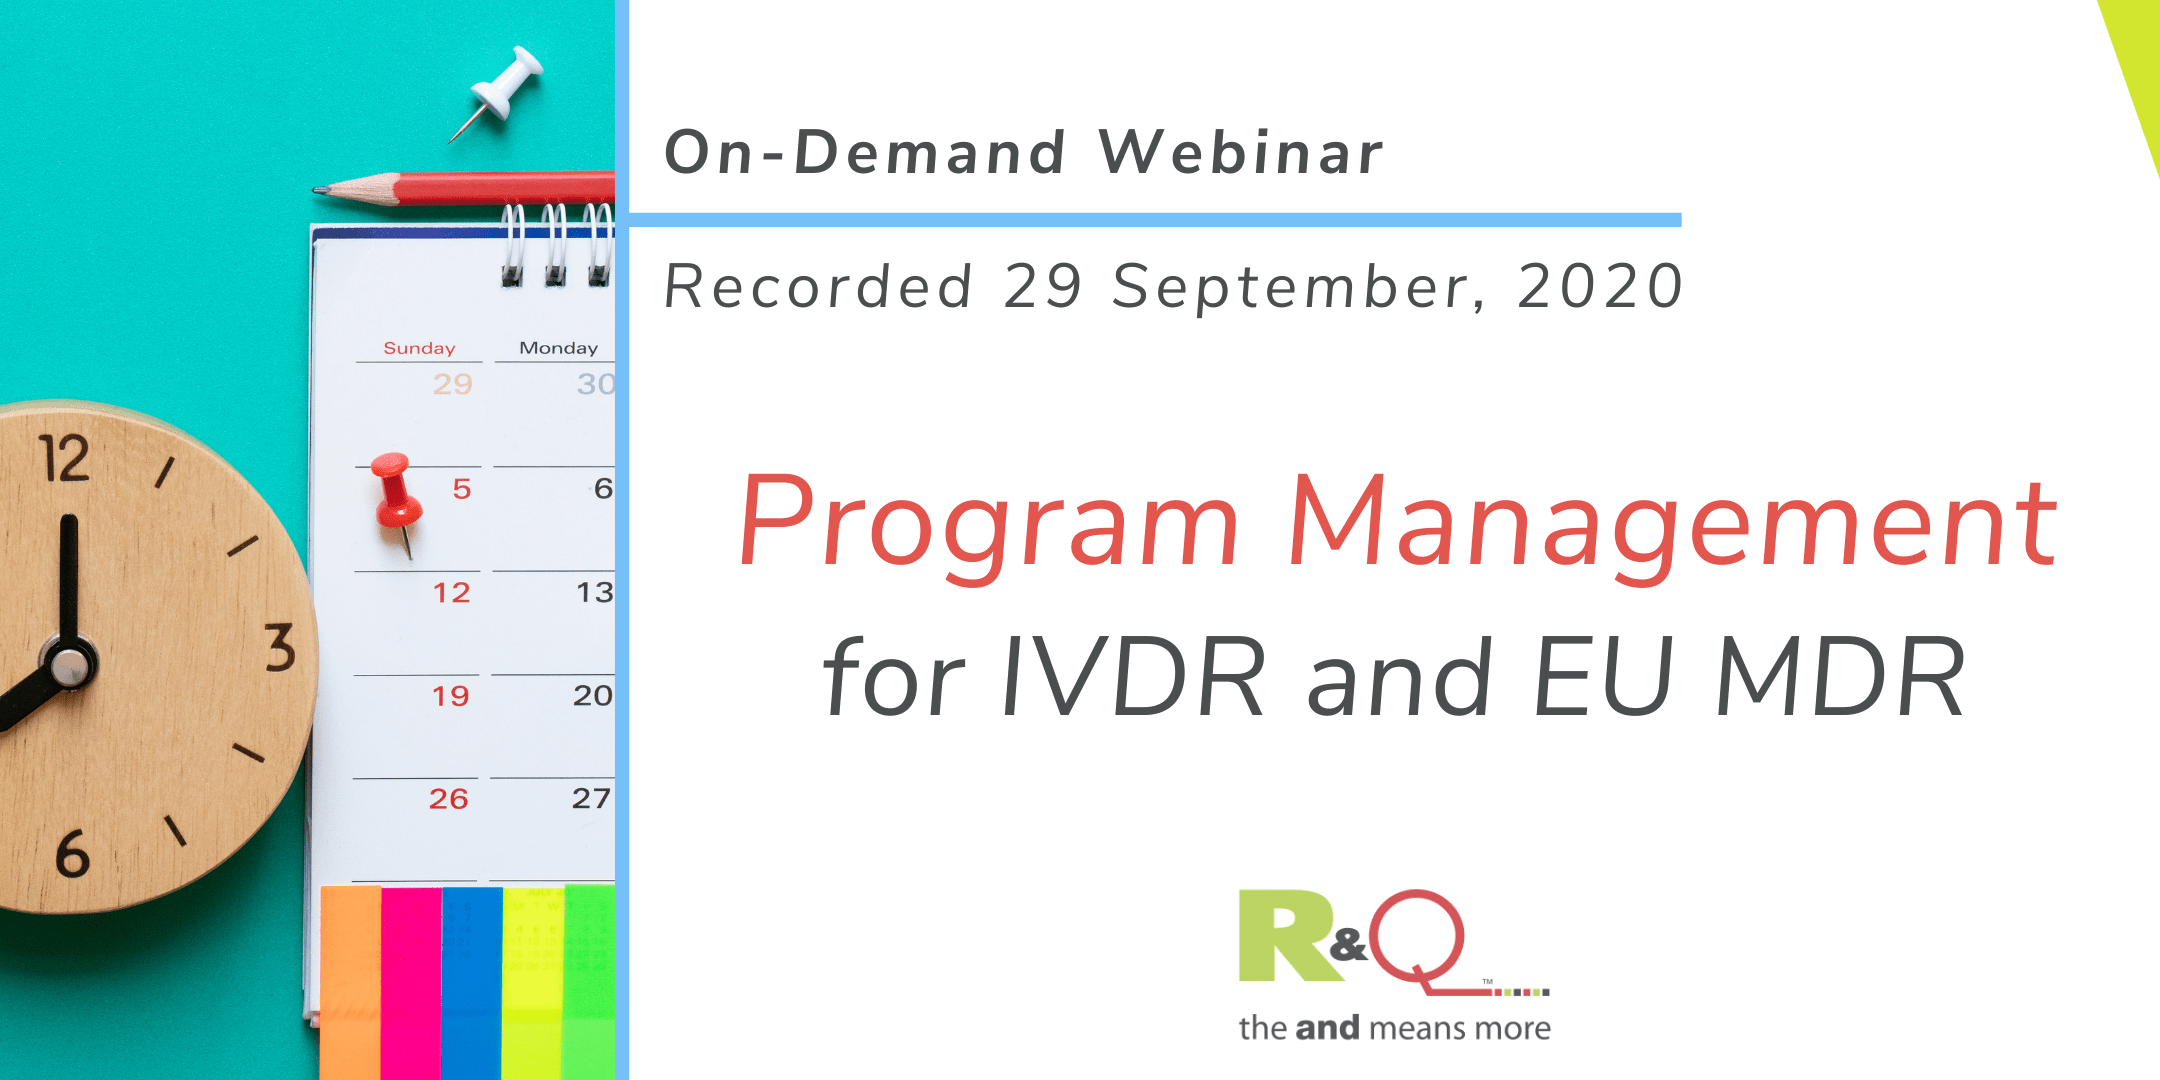 RQ_WB_Program_Management_On_Demand_Promo-min